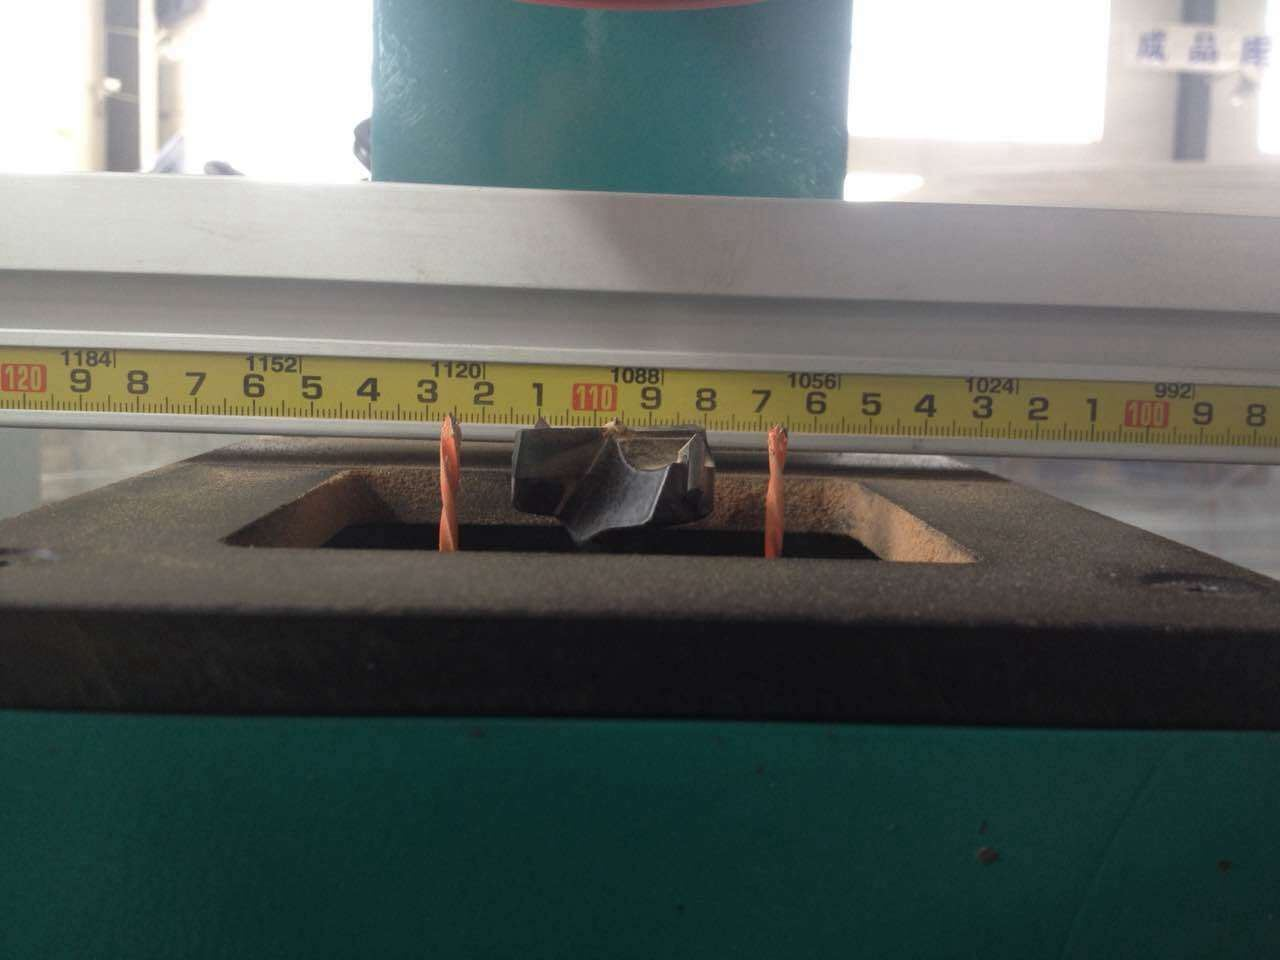 Woodworking Automatic Single Head Hinge Boring Machine F65-1j